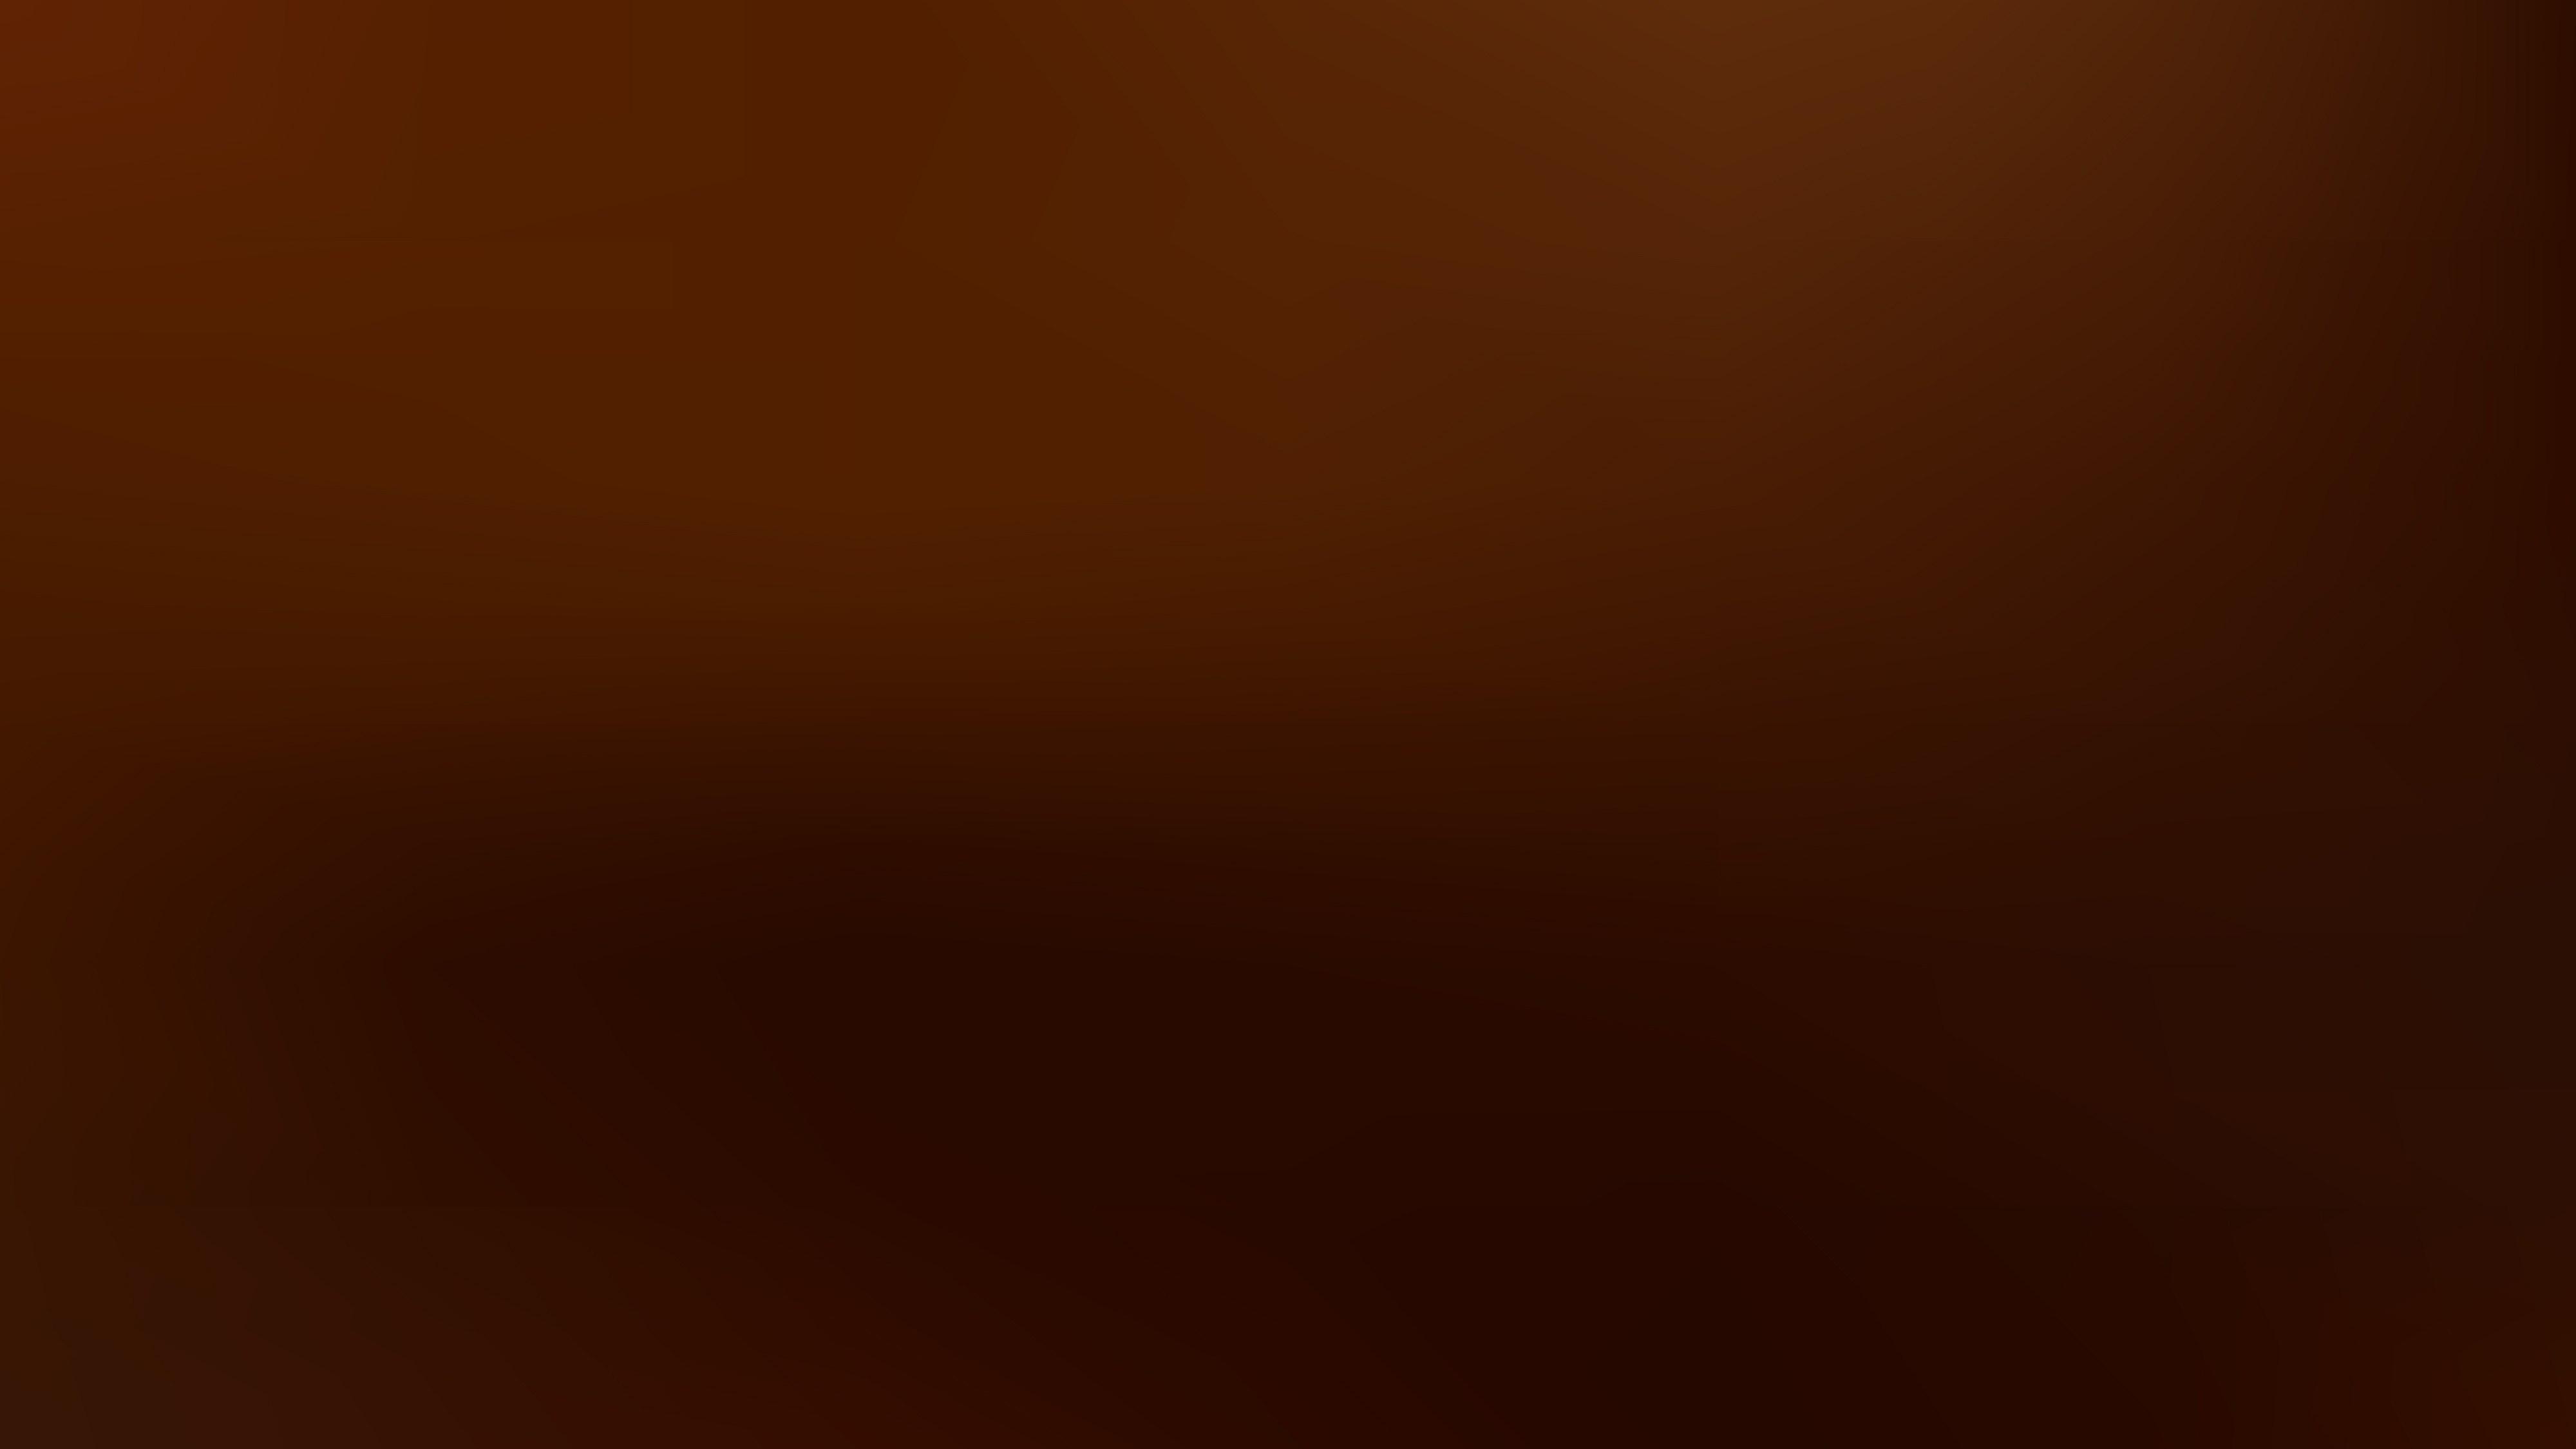 Orange Black Brown Background Image 4000x2250